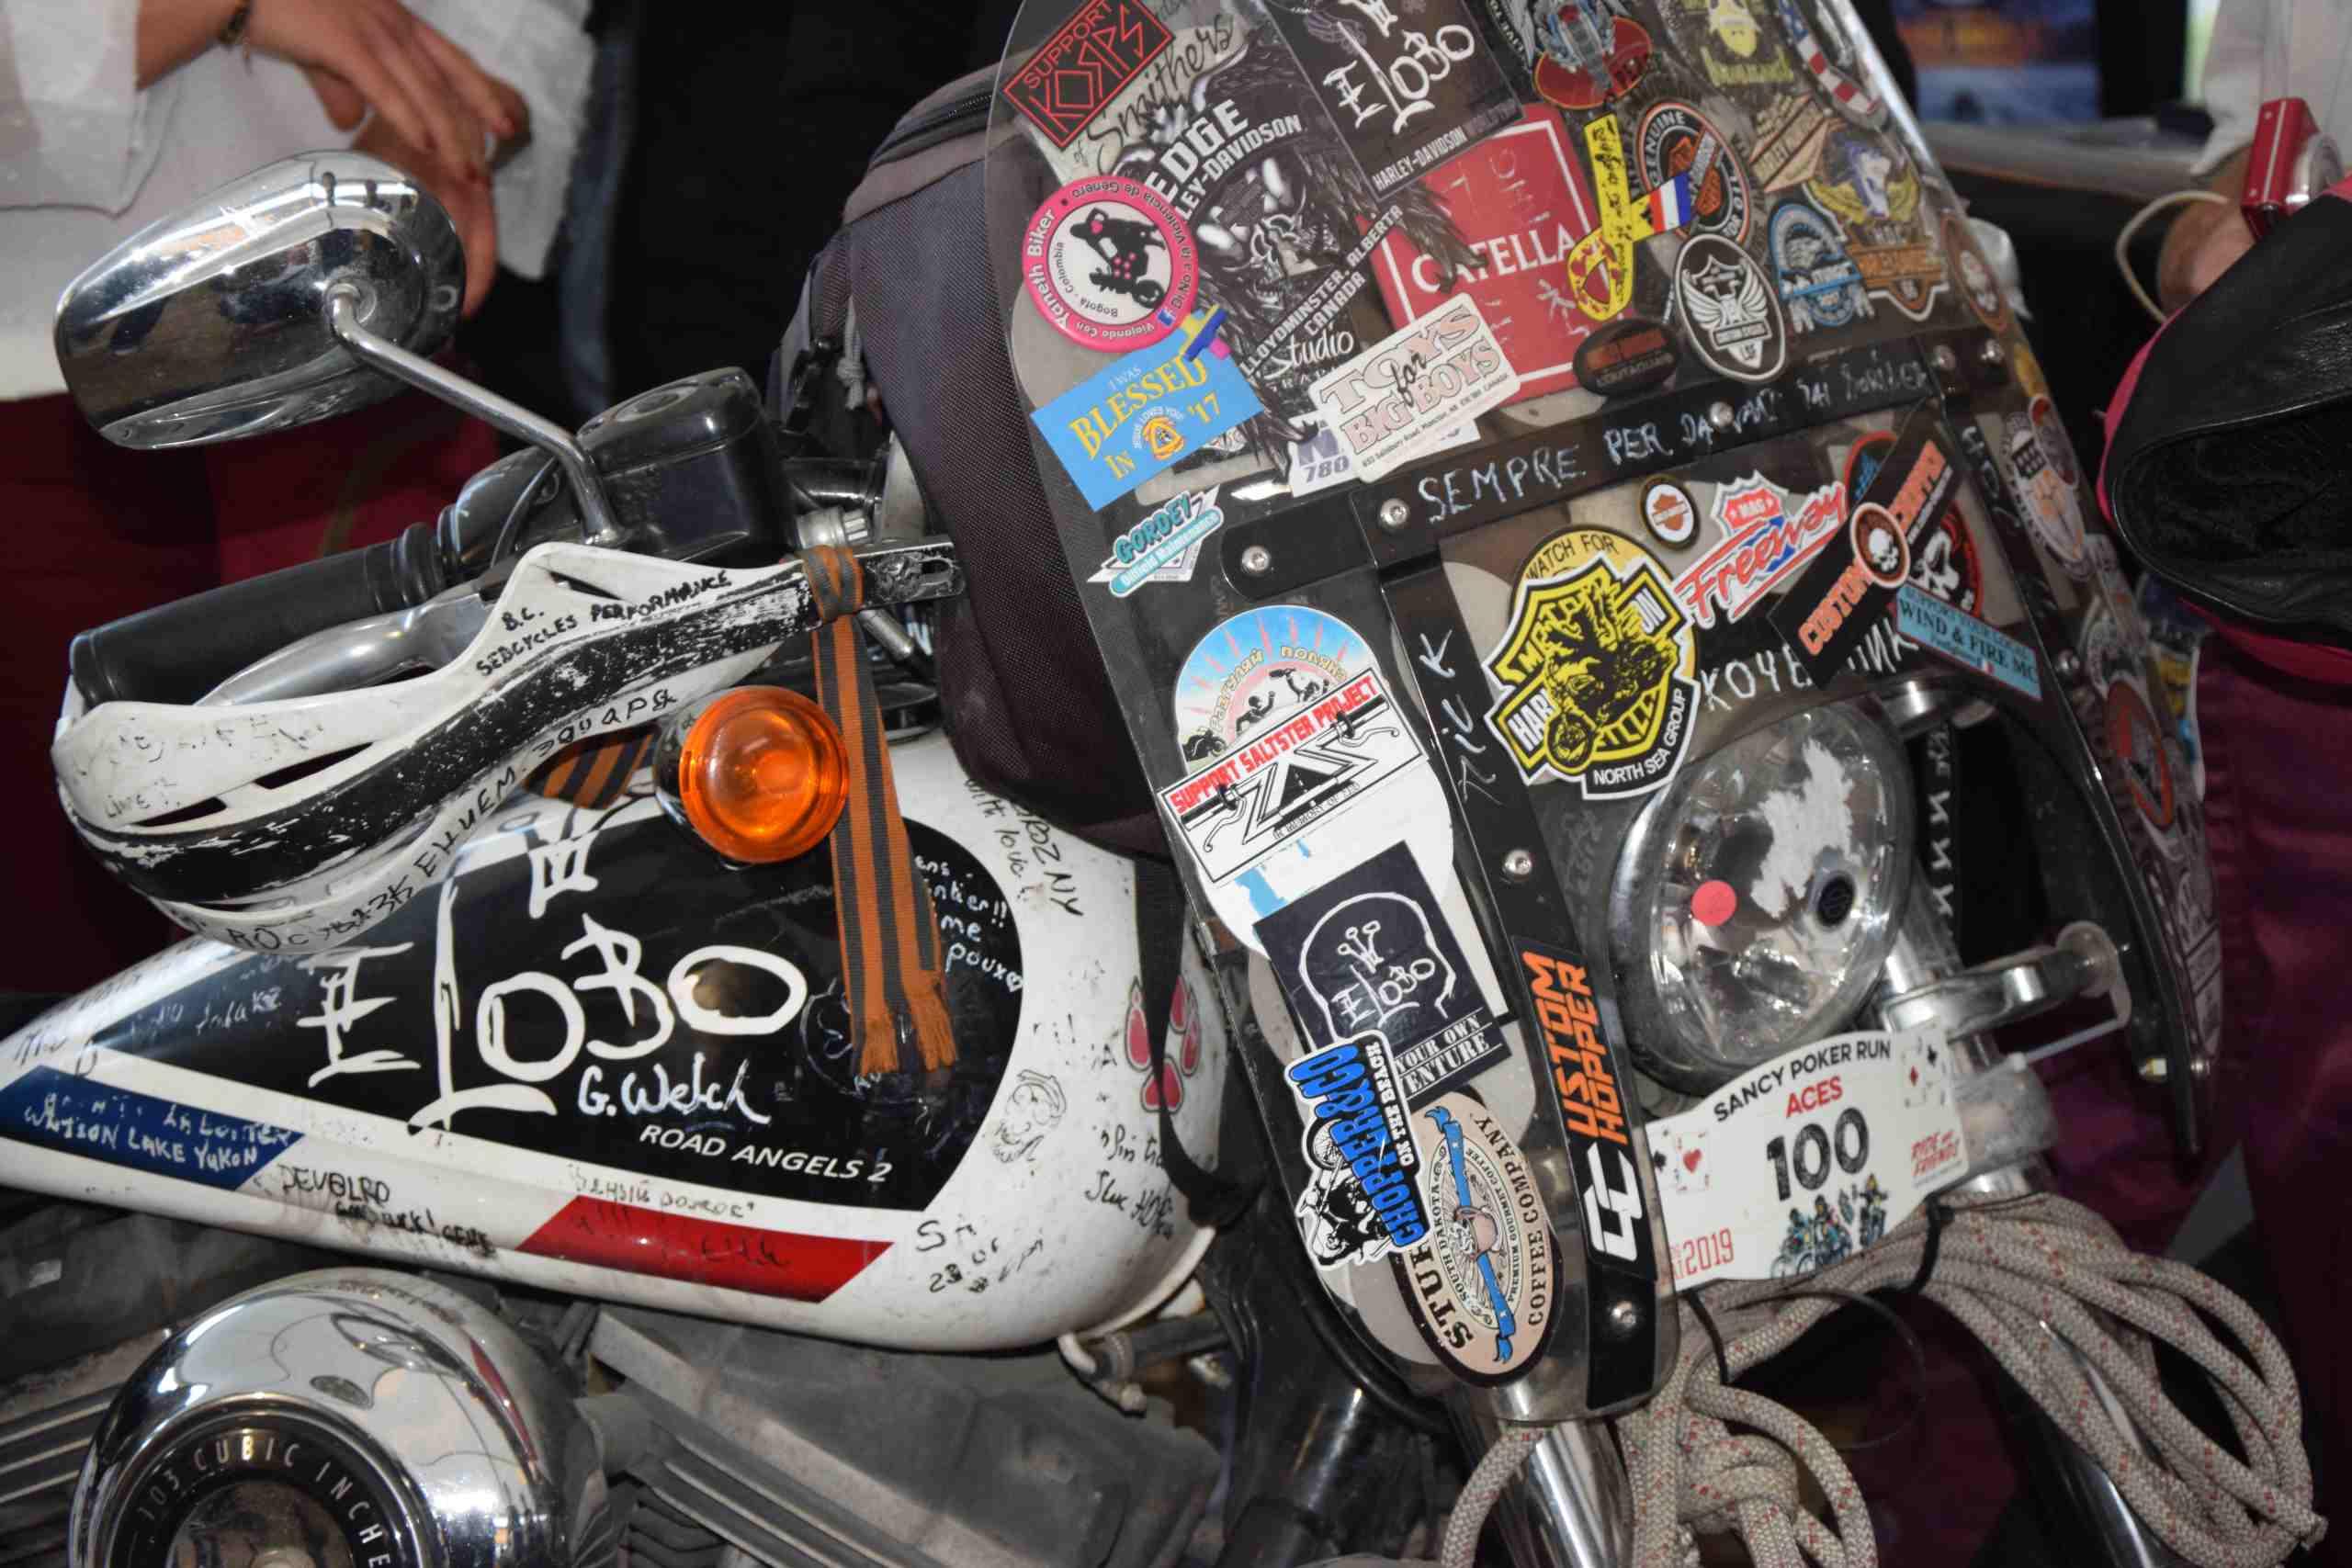 Moto d'Eric LOBO